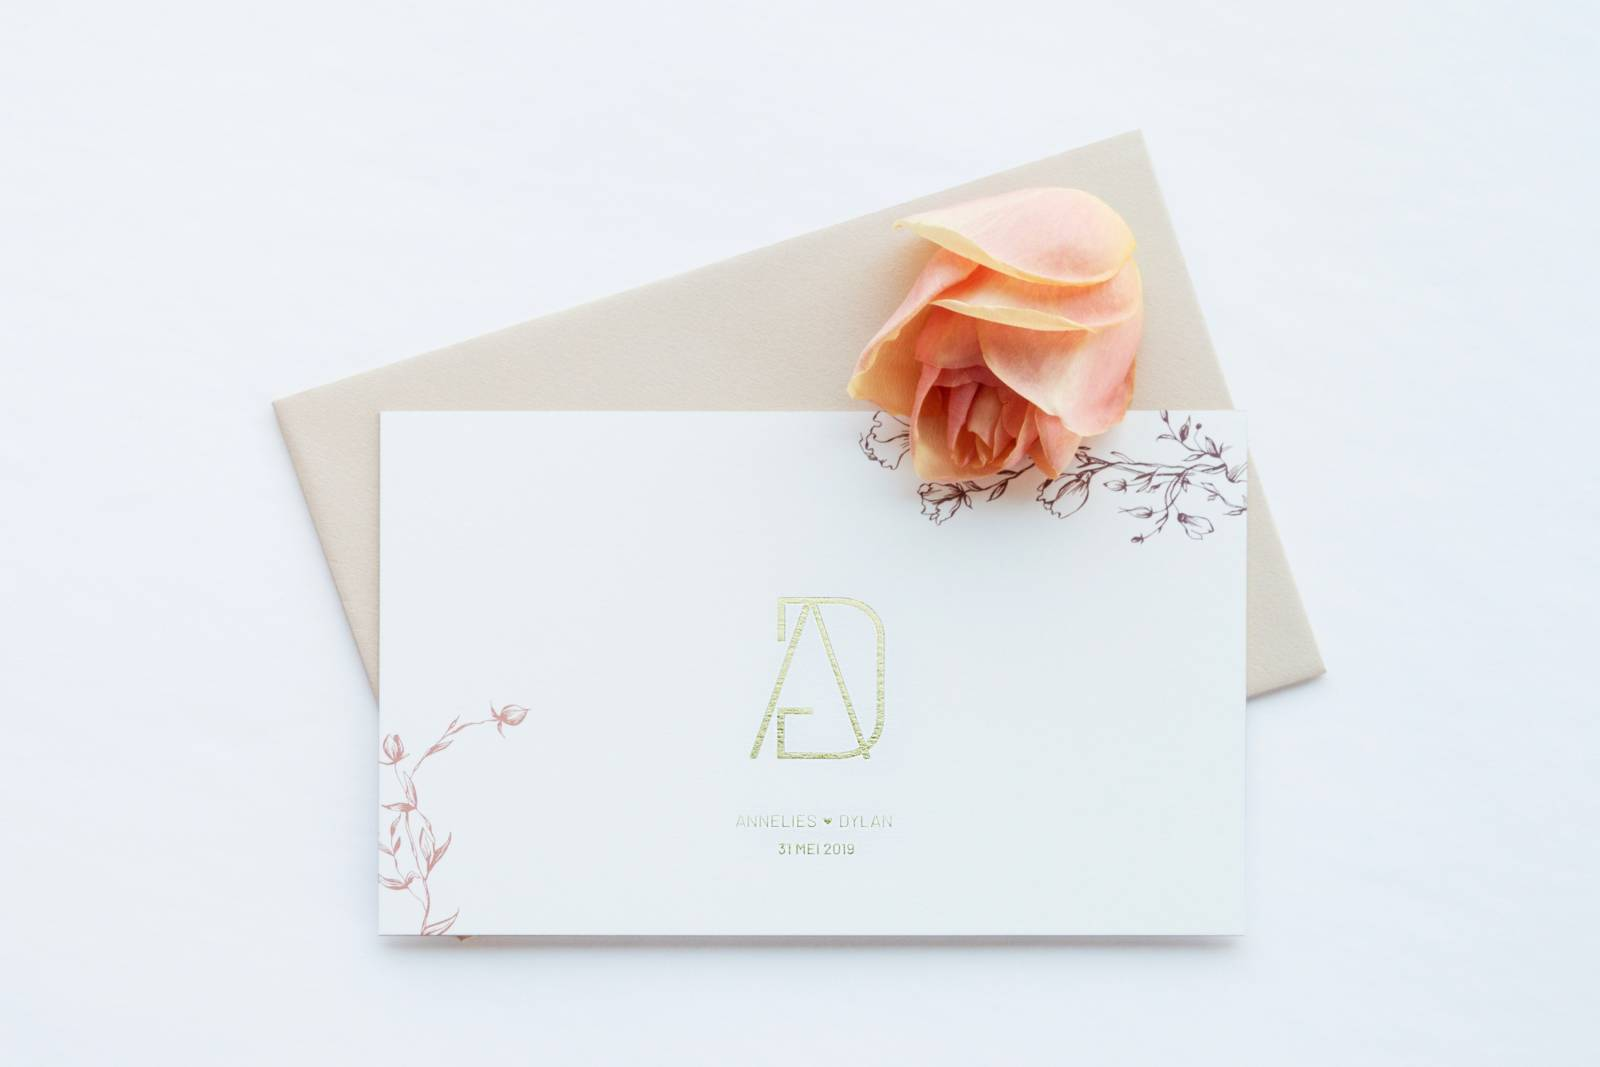 Designcards - trouwuitnodiging - drukwerk huwelijk - grafisch design - House of Weddings - 5